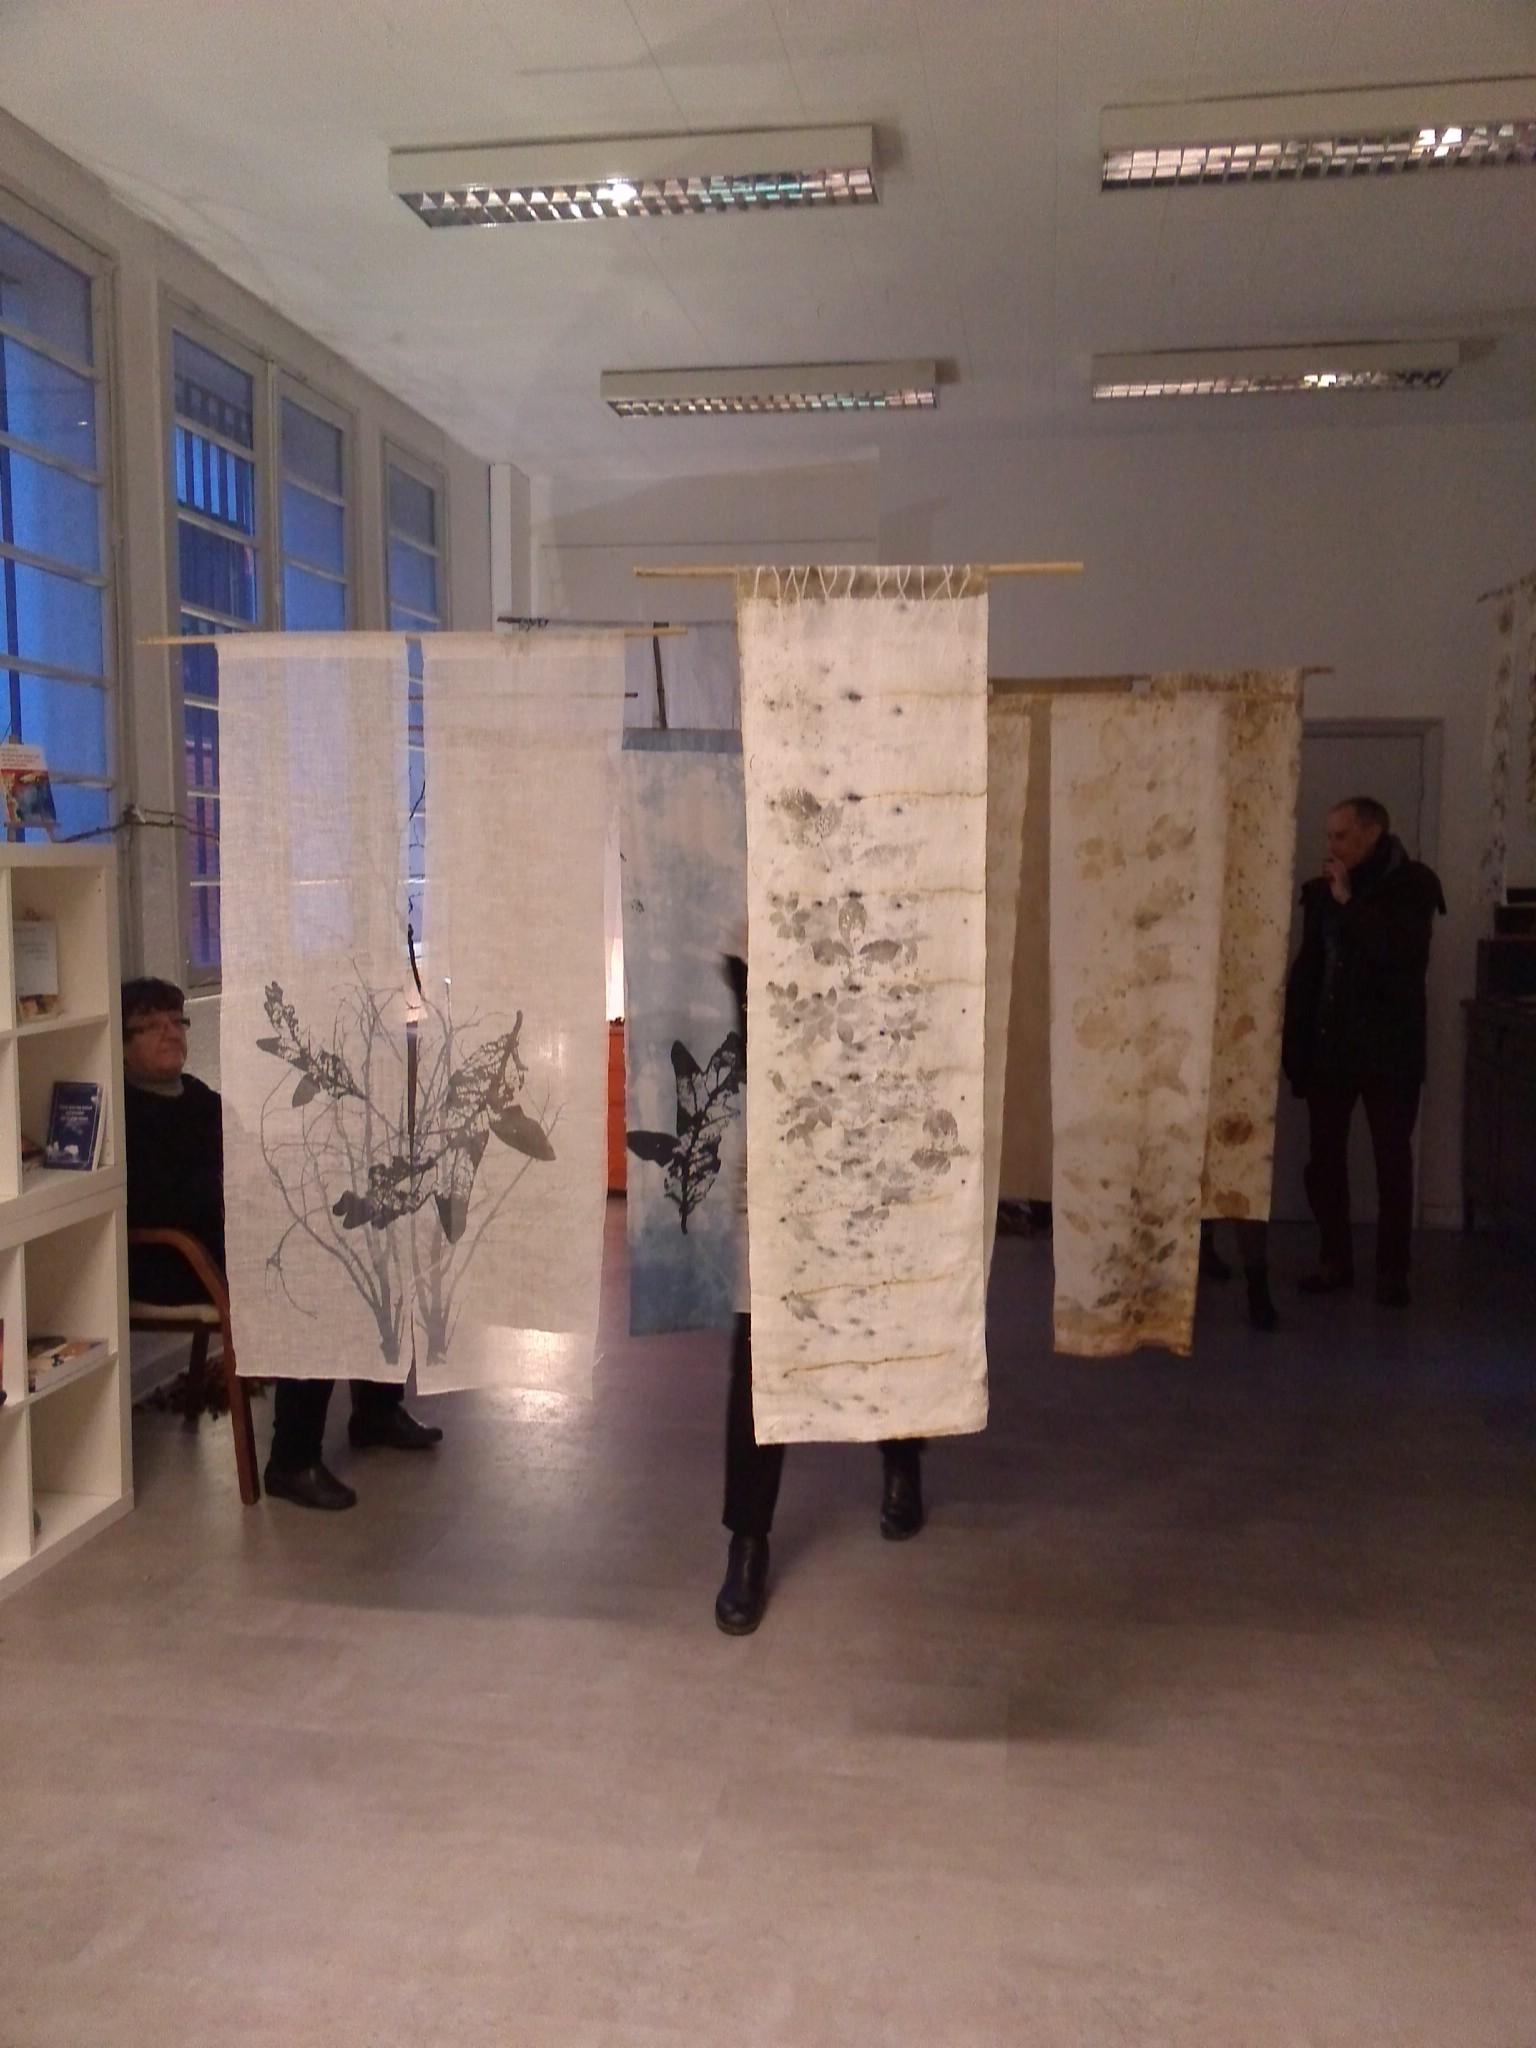 exposition Shinrin-Yoku de mapie des vignes et helena sellergren.